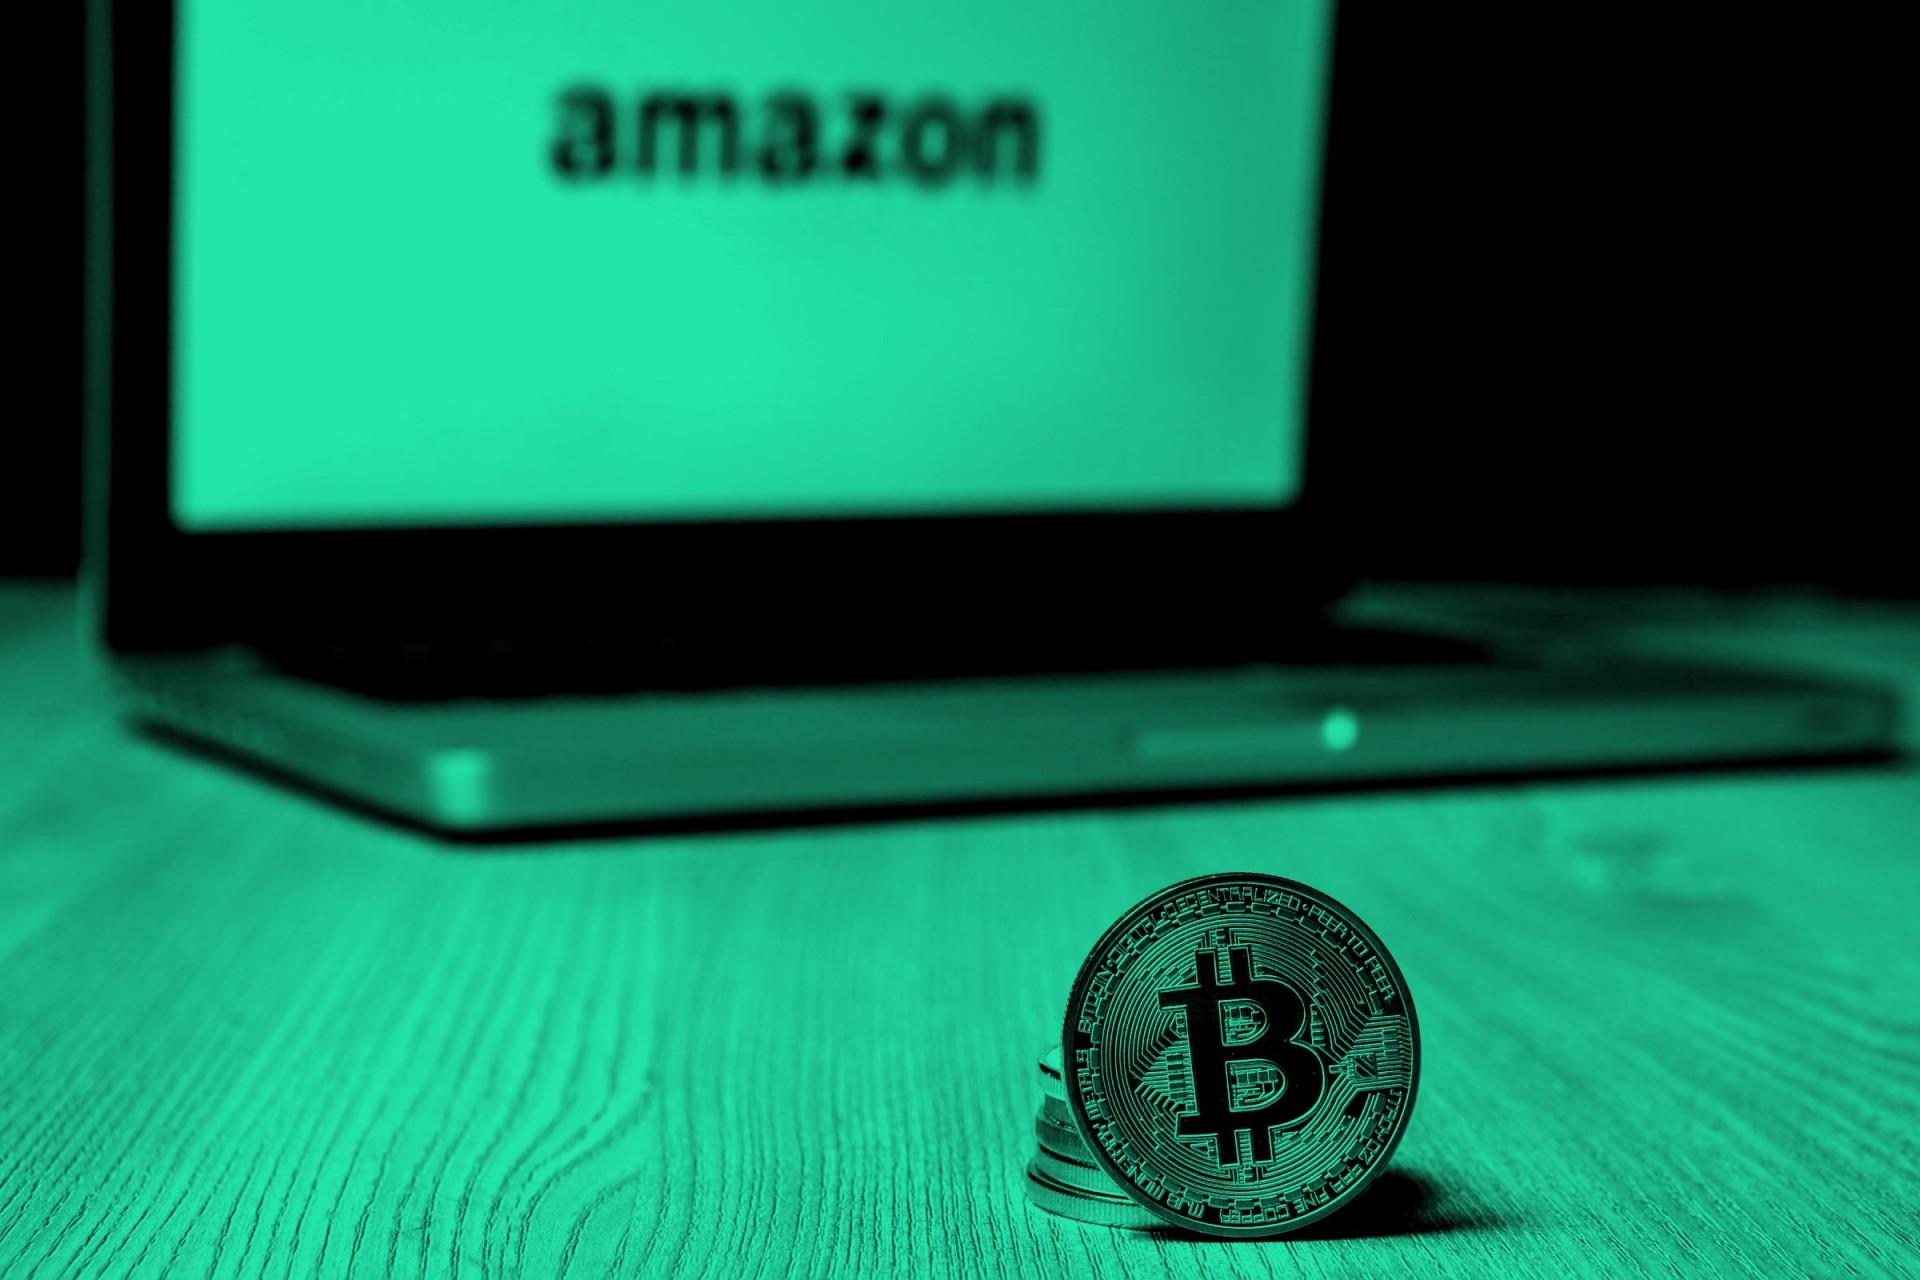 Bitcoin News: Amazon dementiert Bitcoin-Gerüchte